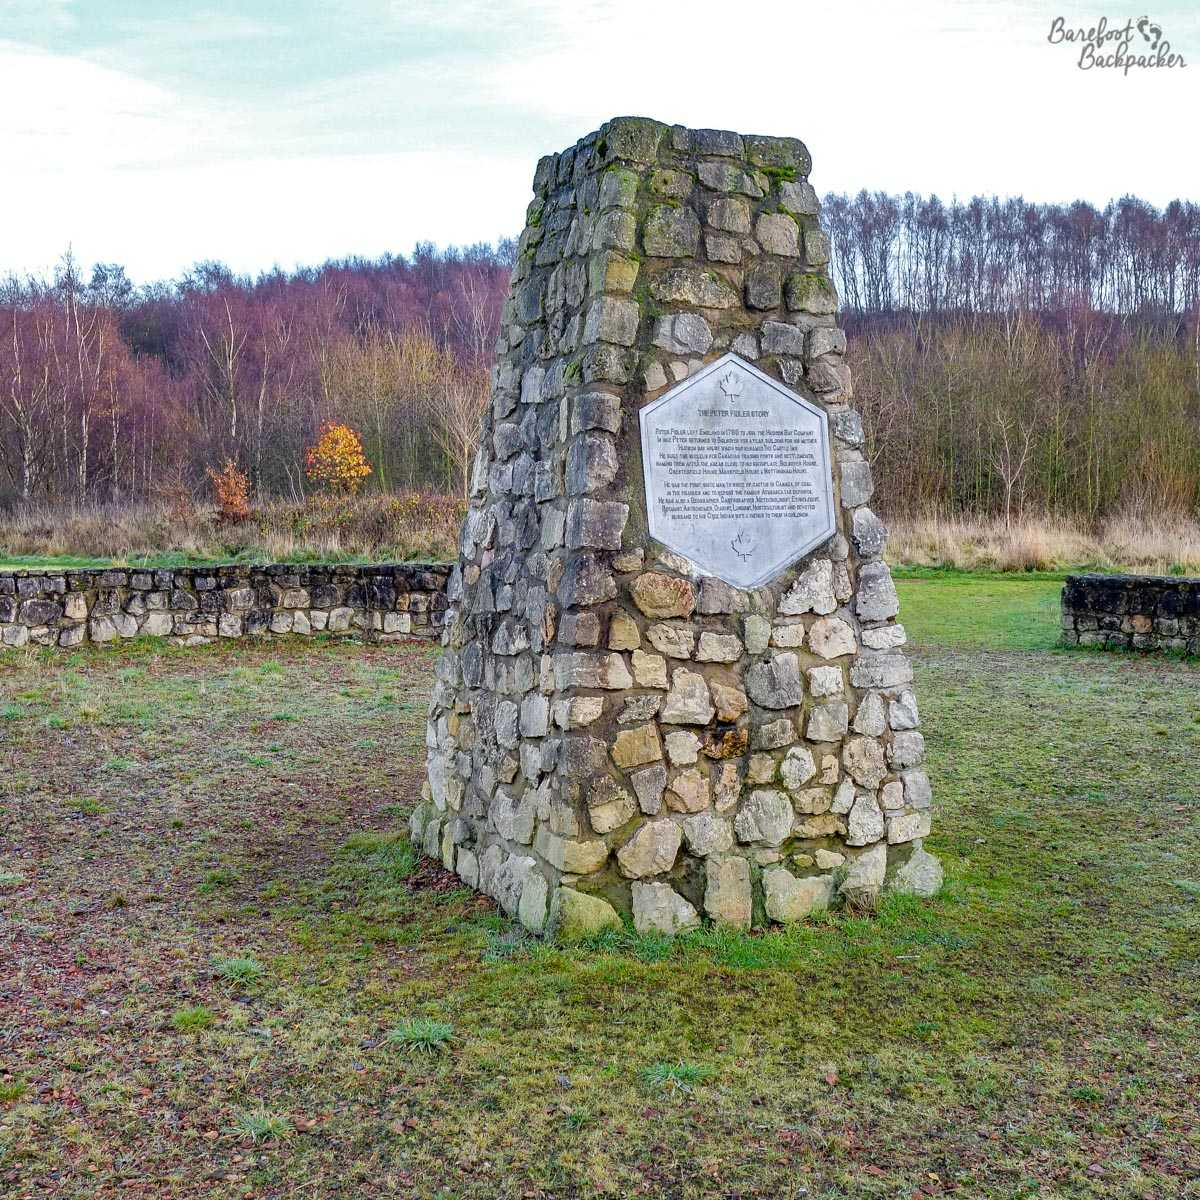 Cairn memorial to Peter Fidler, Bolsover